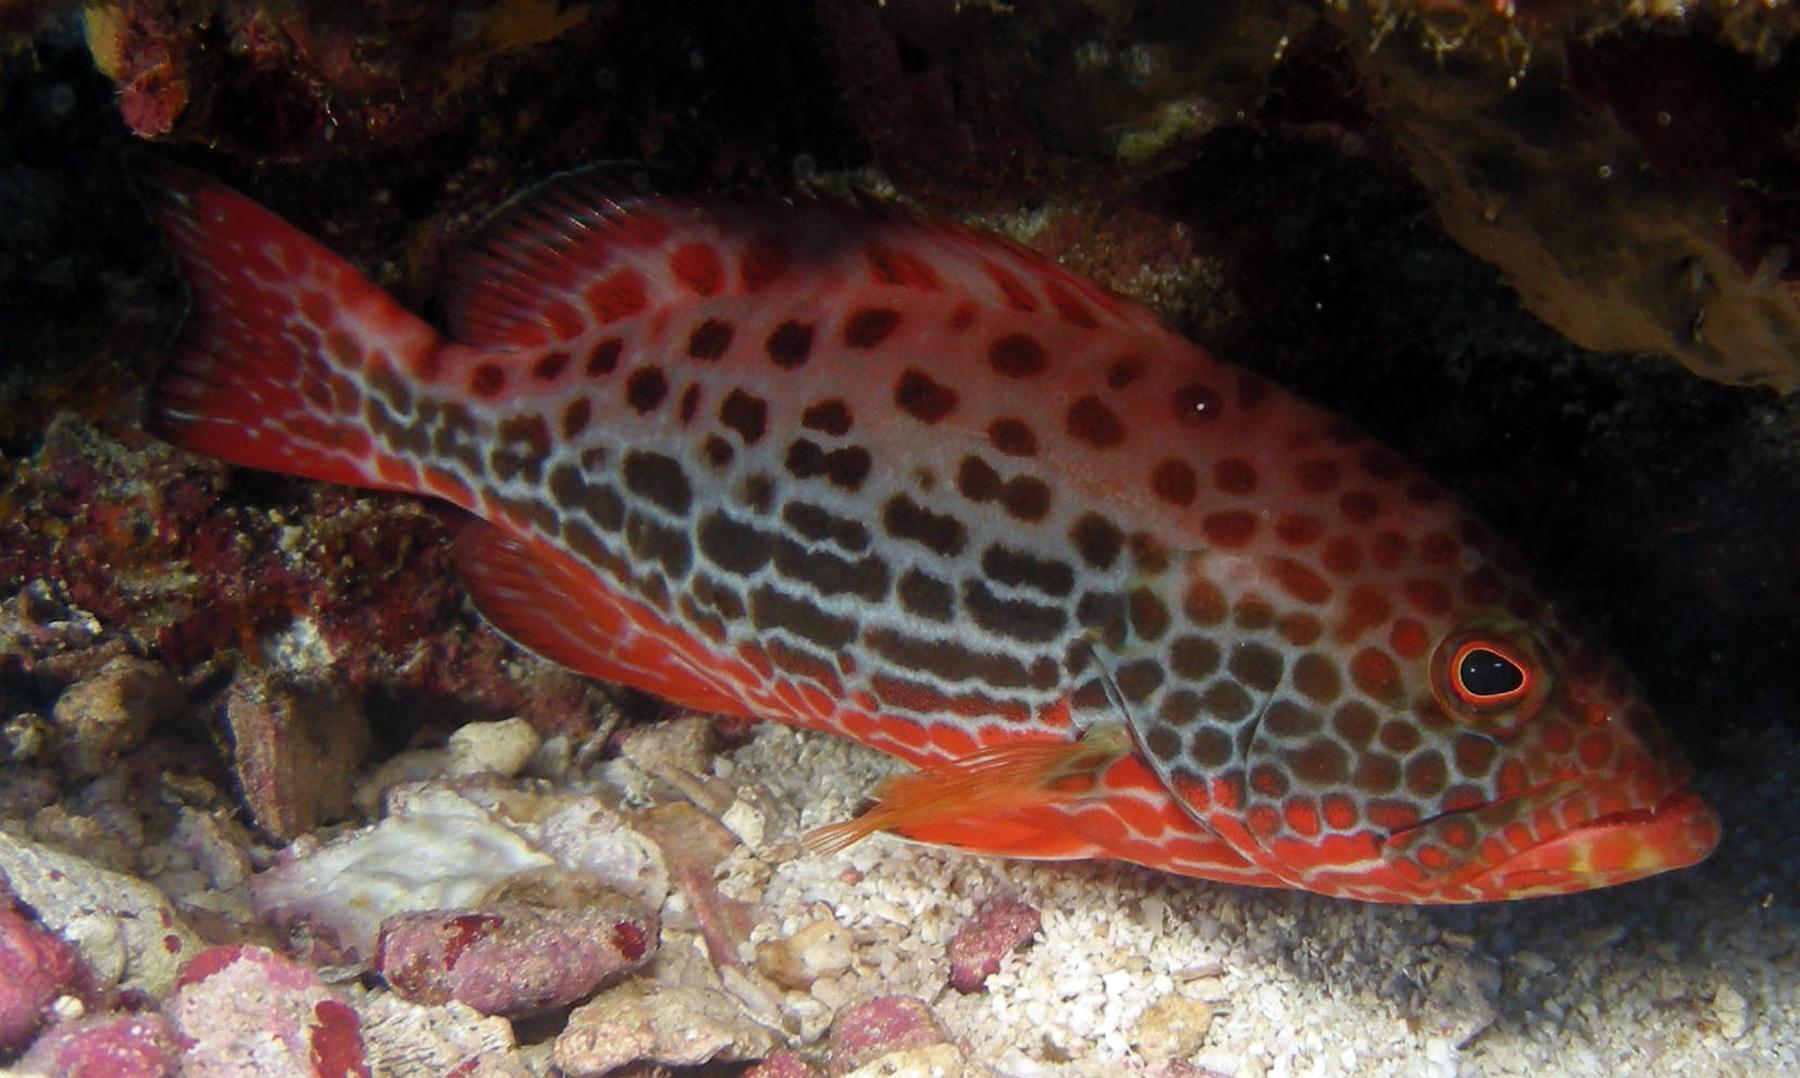 Snappers in Costa Rica | Sportfishing Costa Rica - Fishing, Quepos ...